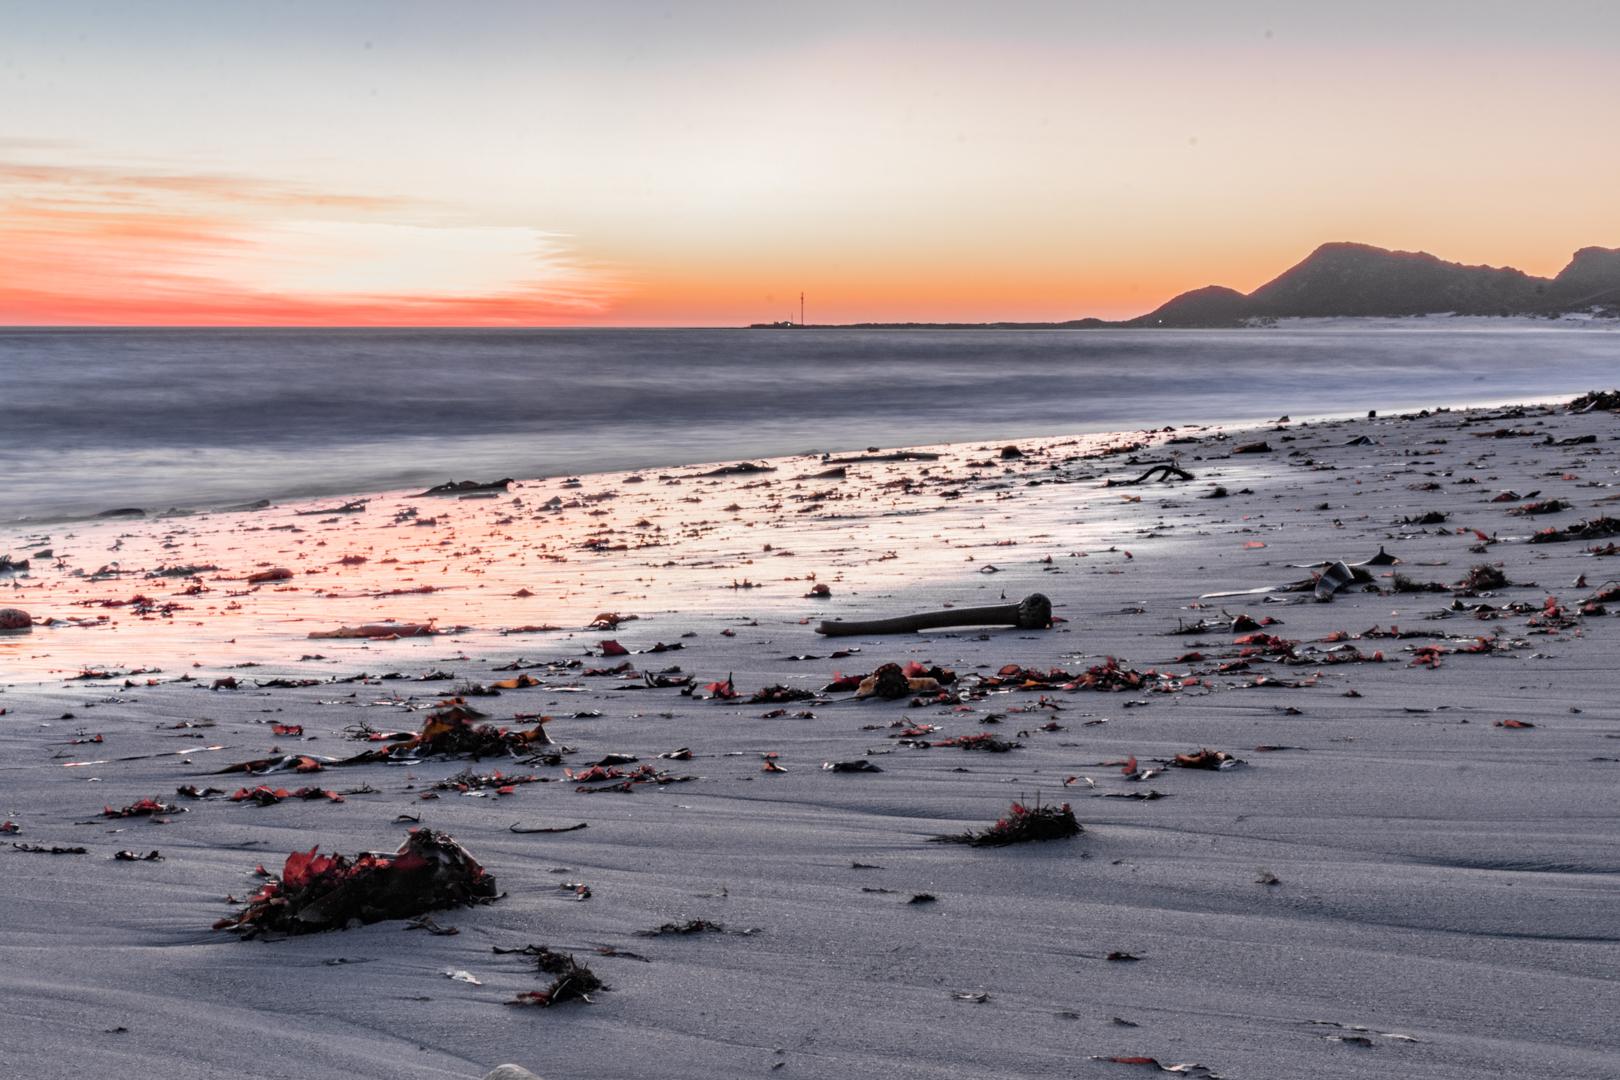 Misty Cliffs Sunset - South Africa - by Ken Treloar Photography-20.jpg